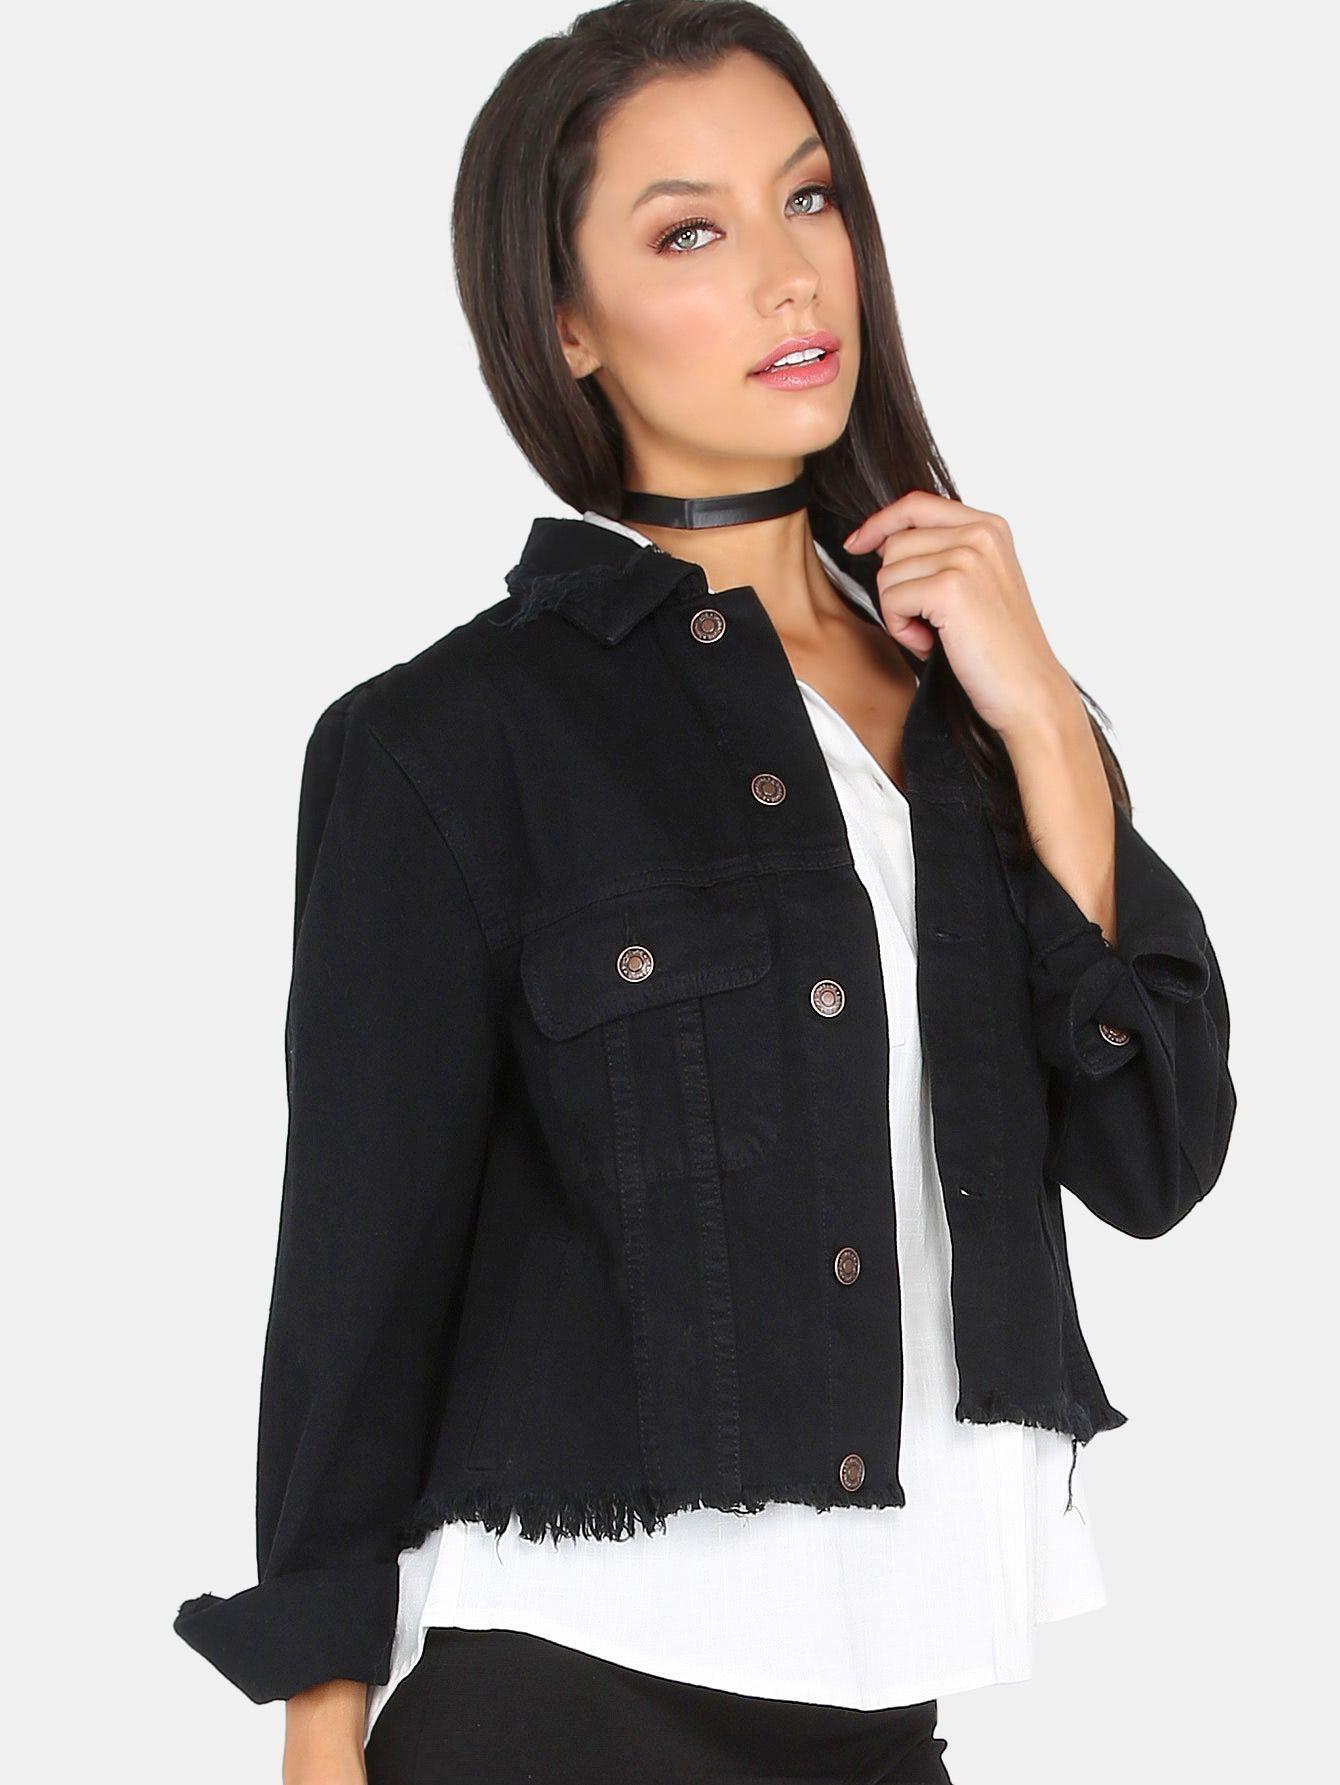 Shop Sequins Lips Back Distressed Denim Jacket Black Online Shein Offers Sequins Lips Bac Distressed Denim Jacket Black Coats Jackets Women Streetwear Jackets [ 1785 x 1340 Pixel ]